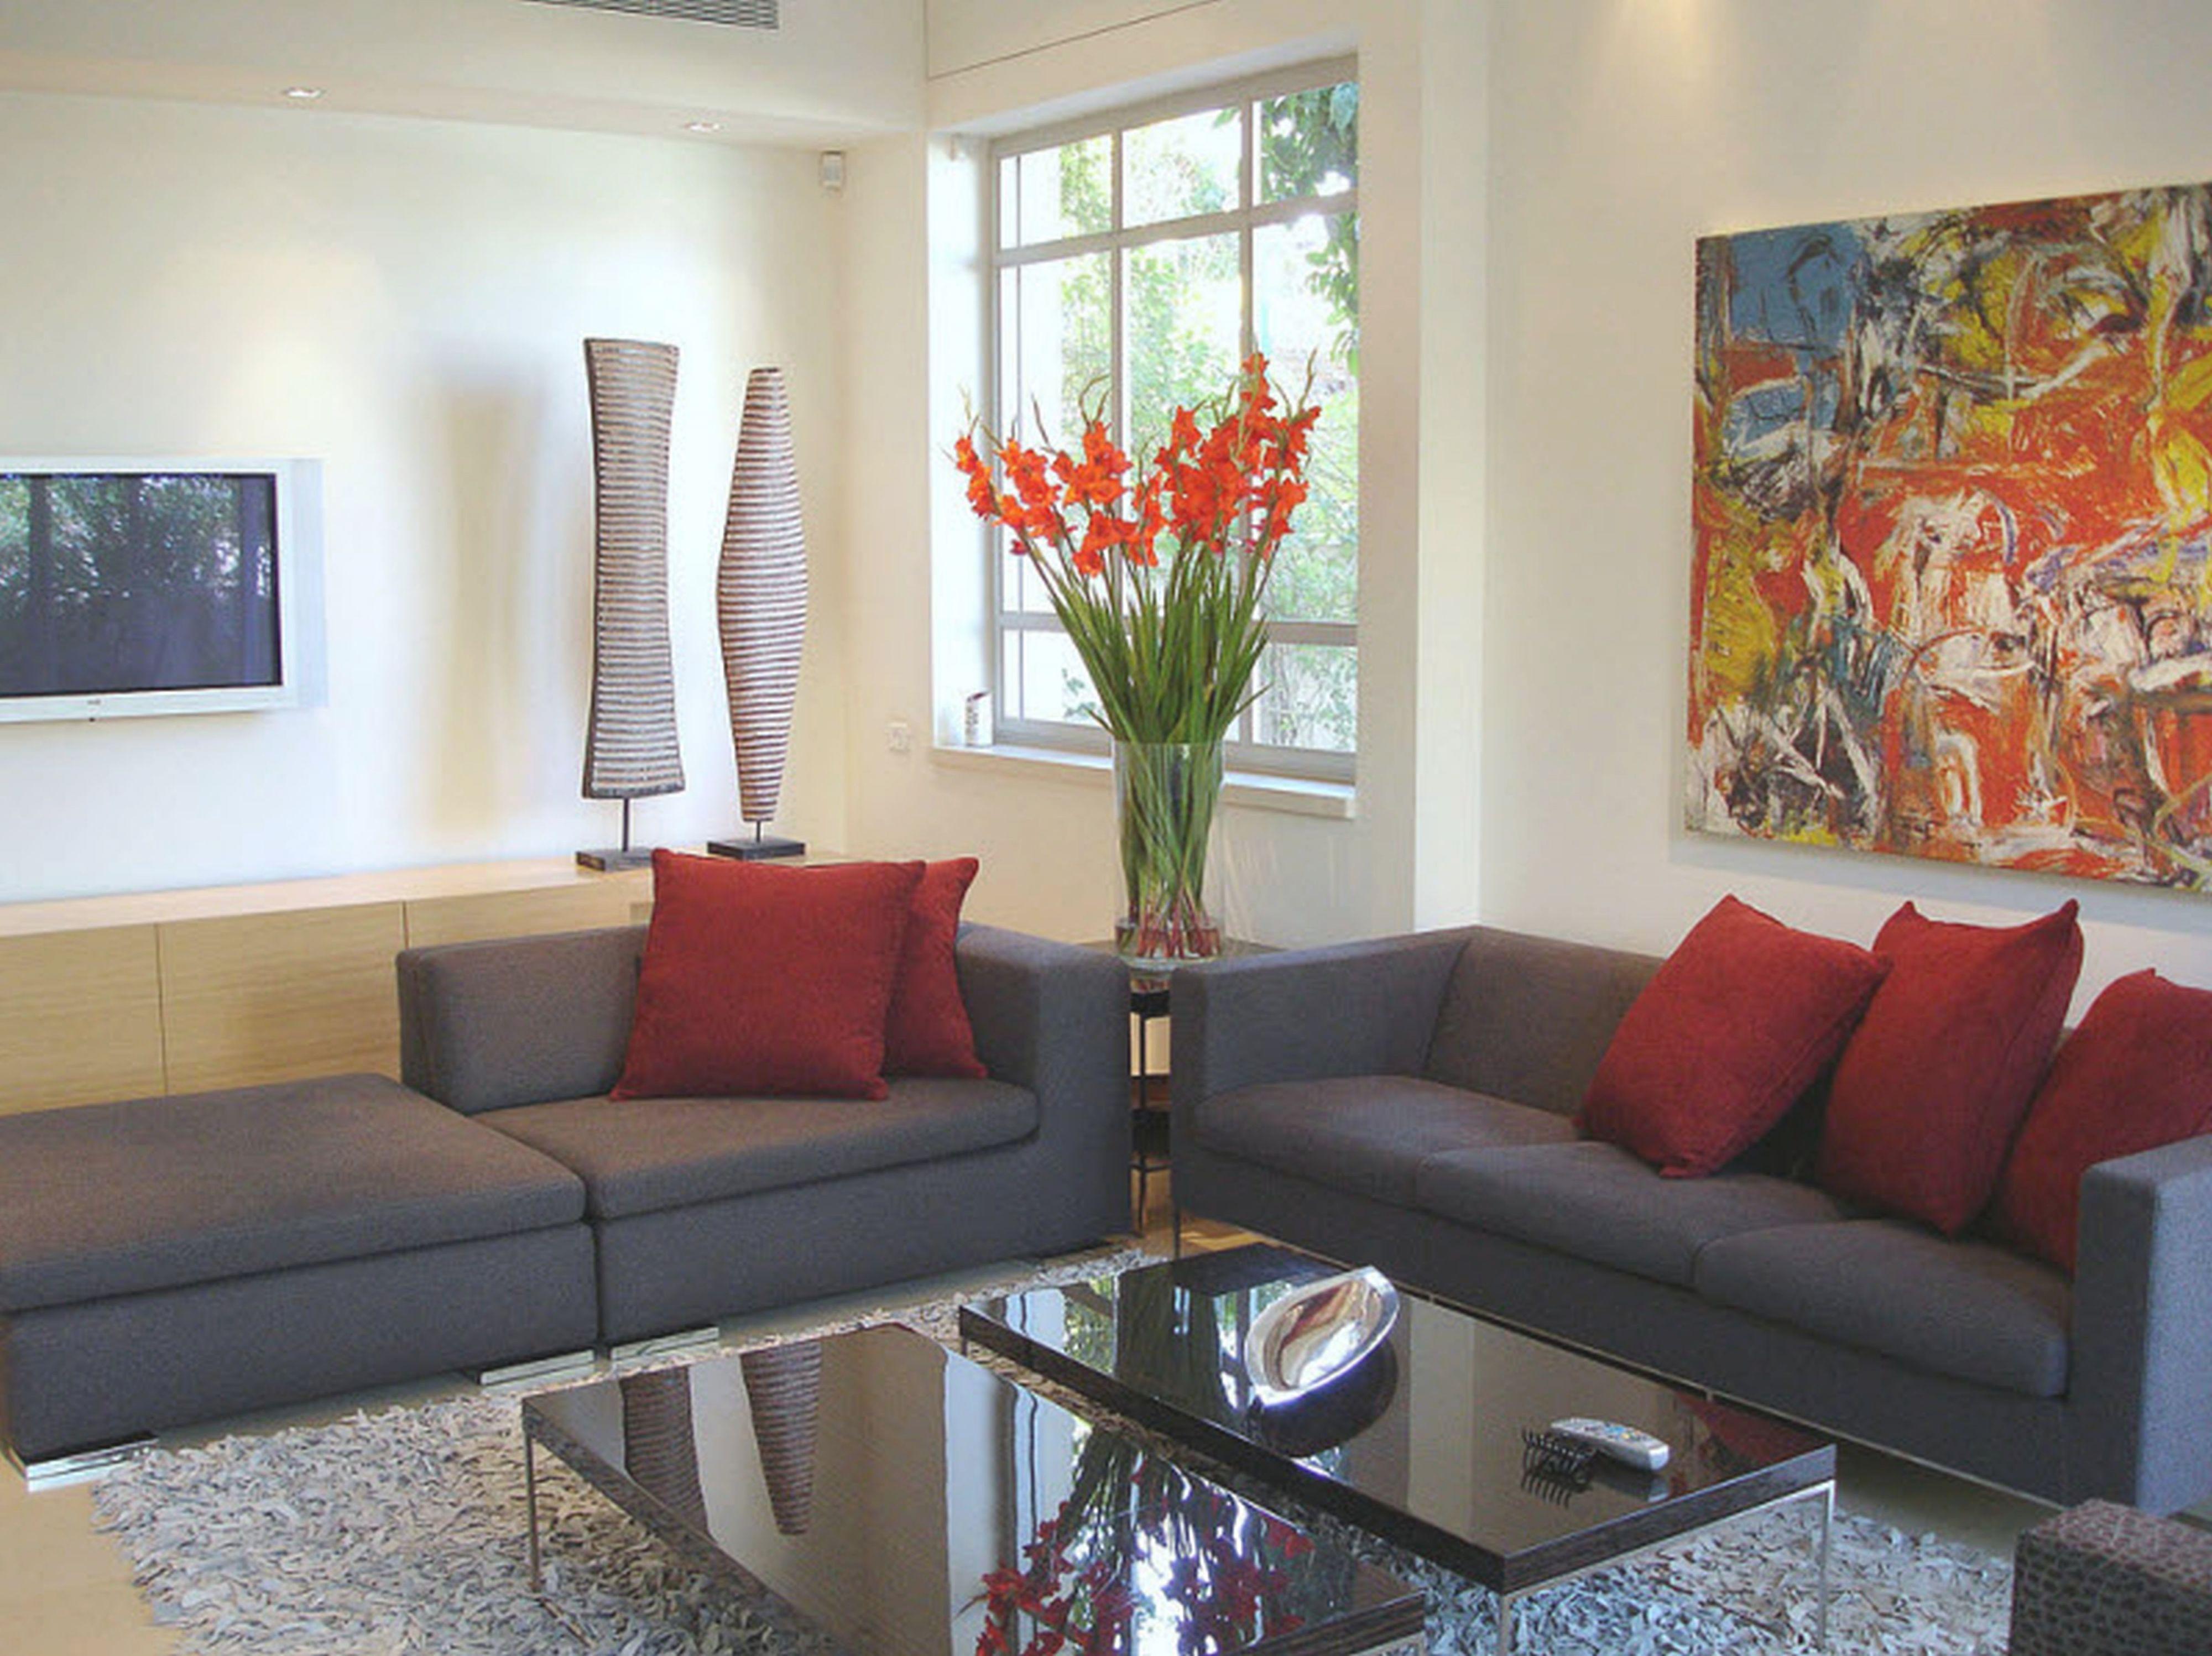 Unique Apartment Living Room Decorating Ideas On A Budget ...